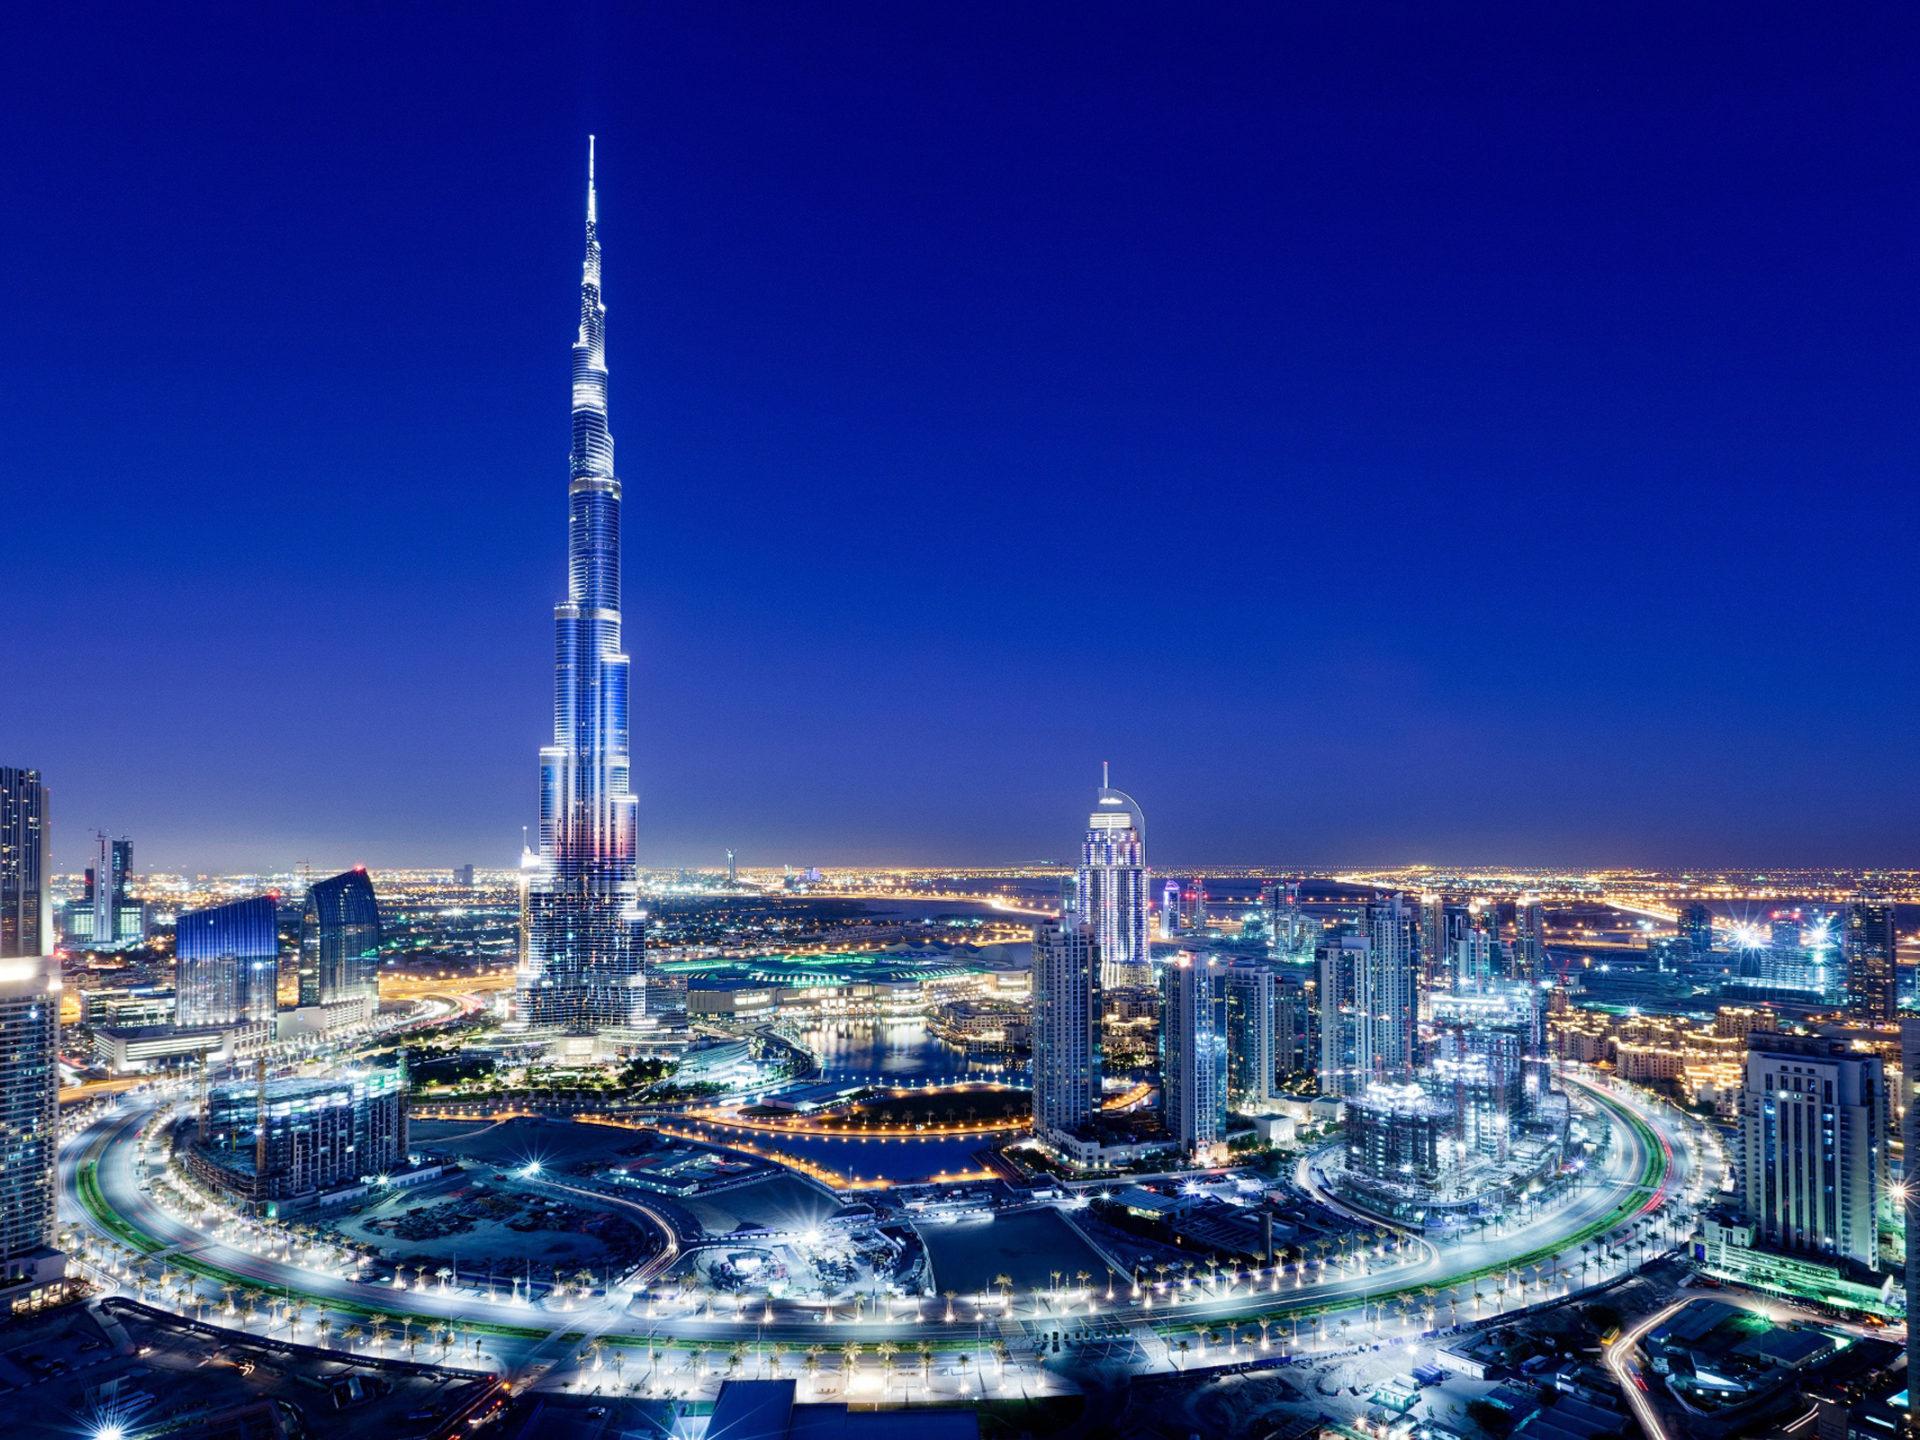 London Wallpaper Hd 1920x1080 Dubai City Night Amazing Facilities Burj Khalifa Hd